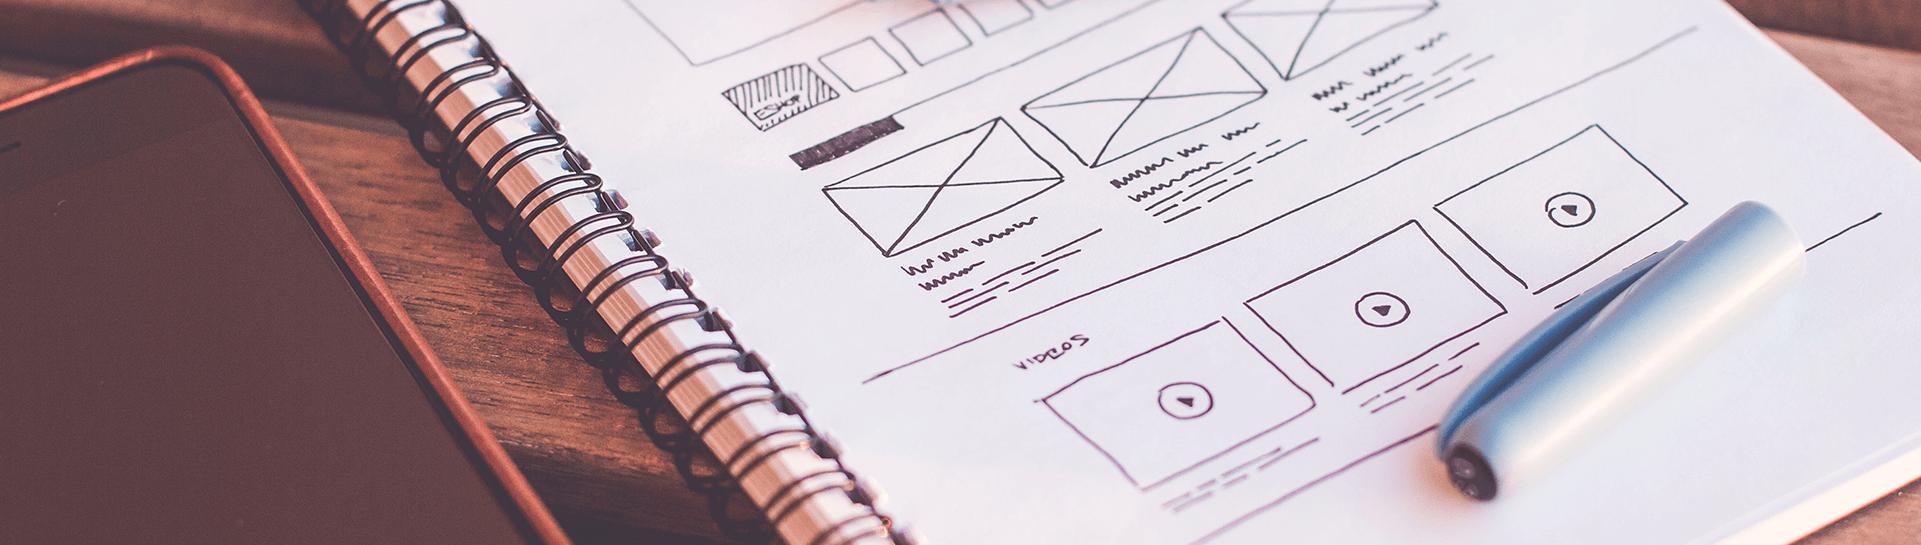 Wireframes sketched by a UX designer